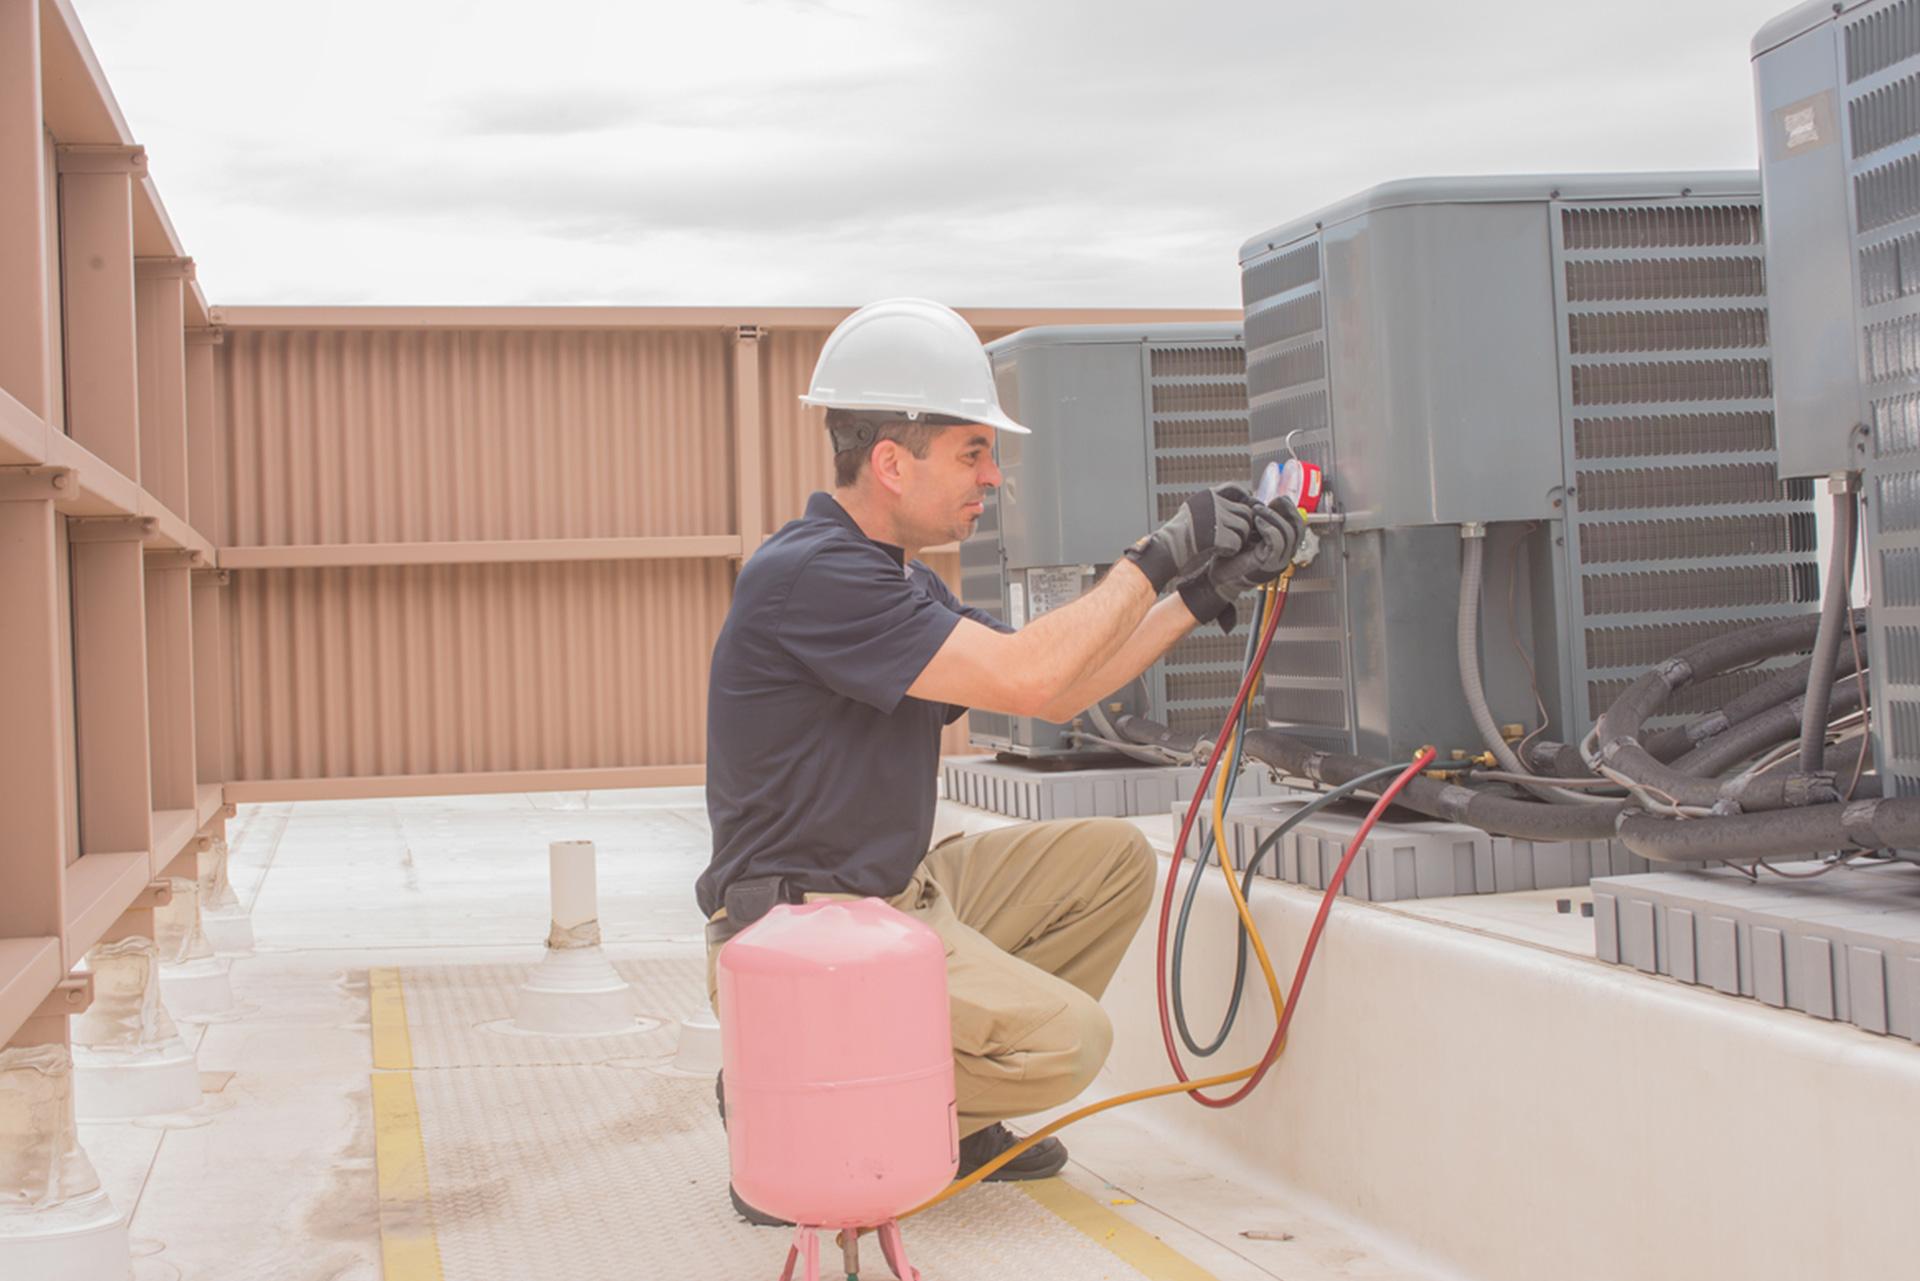 National HVAC/R Service